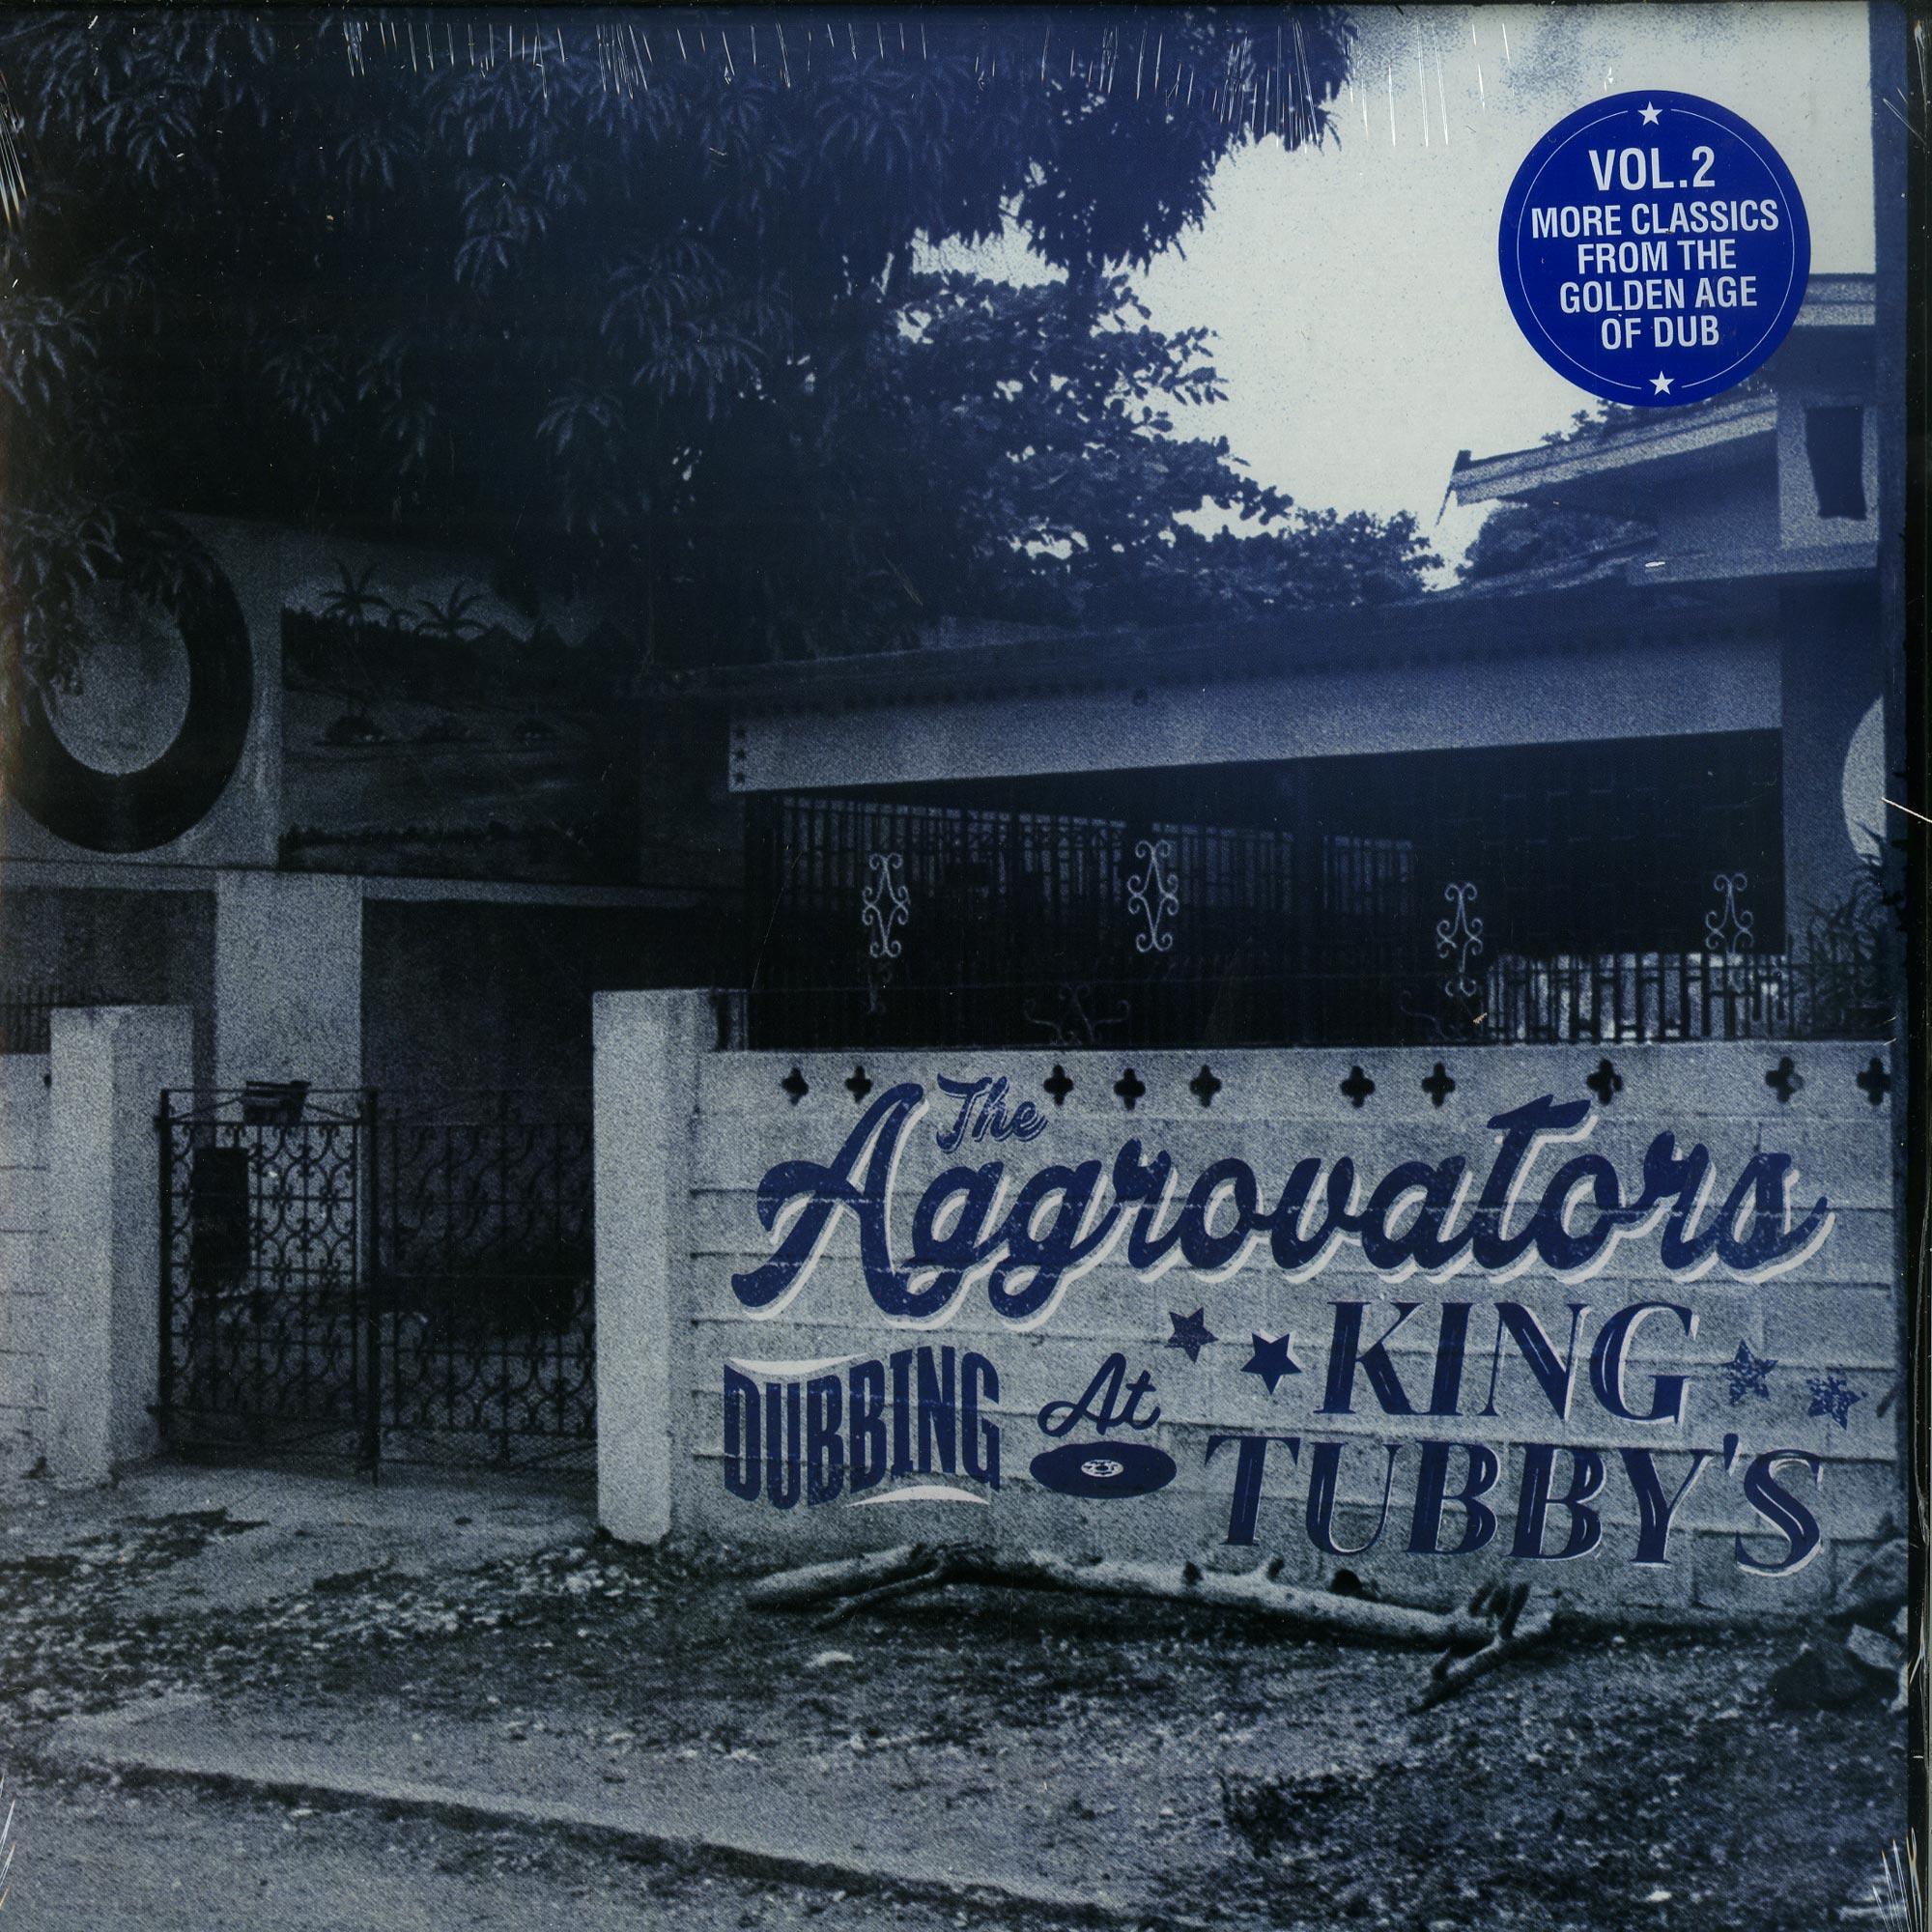 Aggrovators - DUBBING AT KING TUBBYS VOL. 2